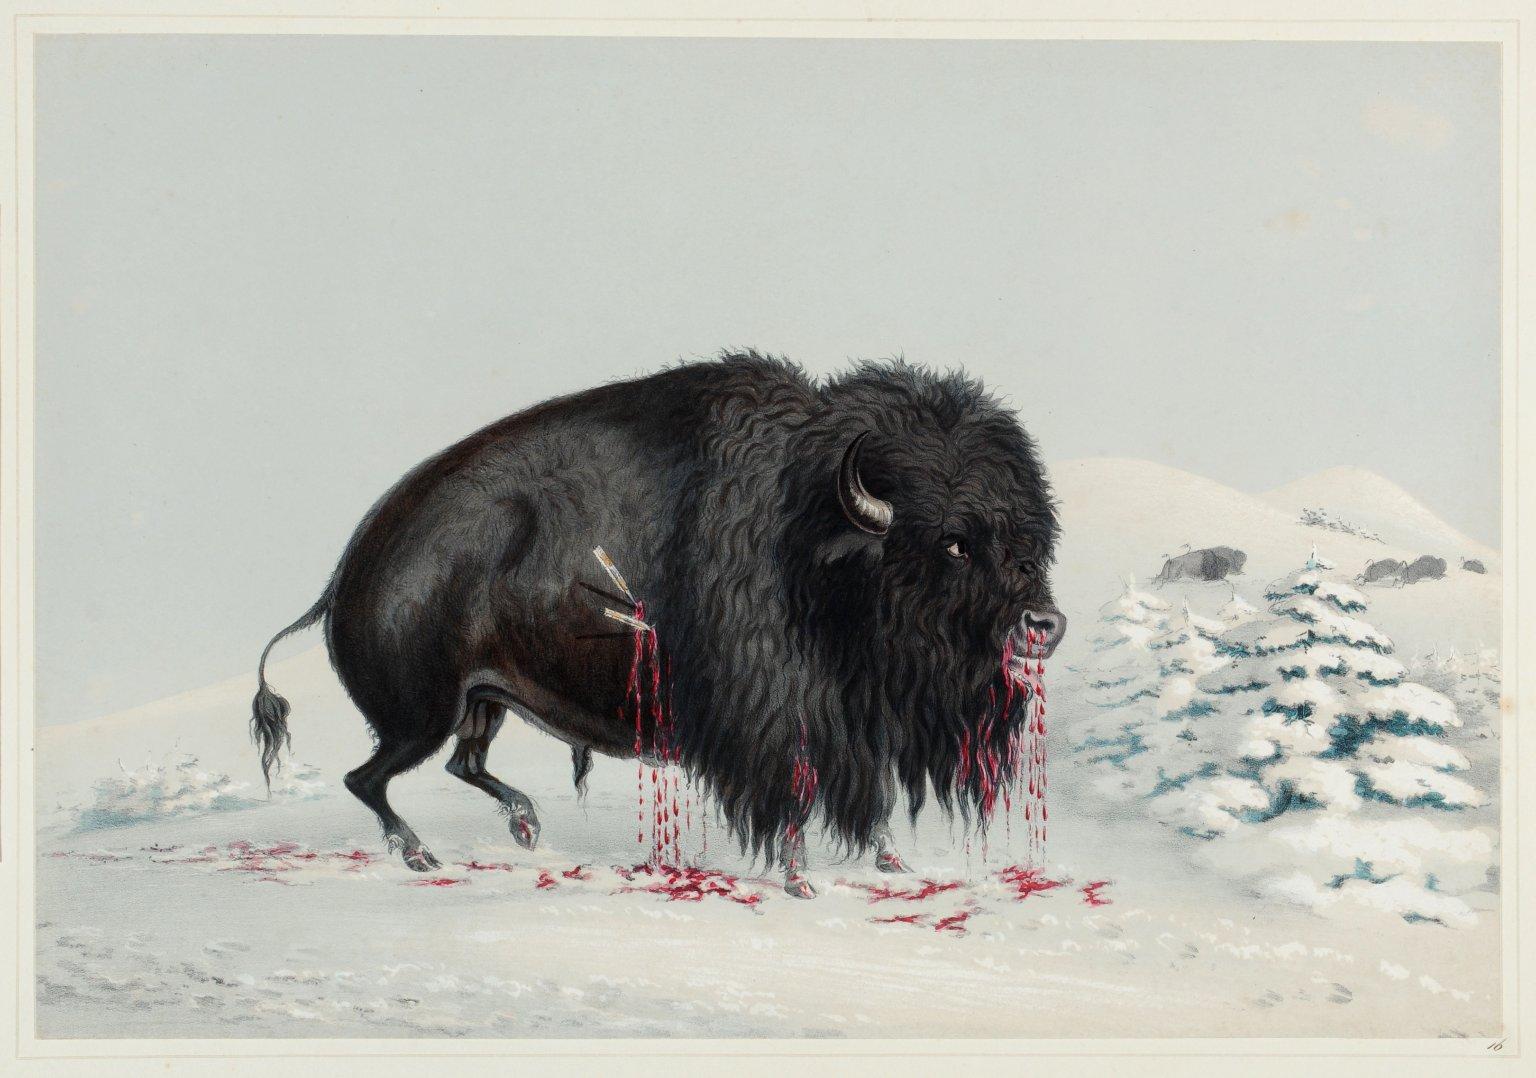 Wounded Buffalo Bull.